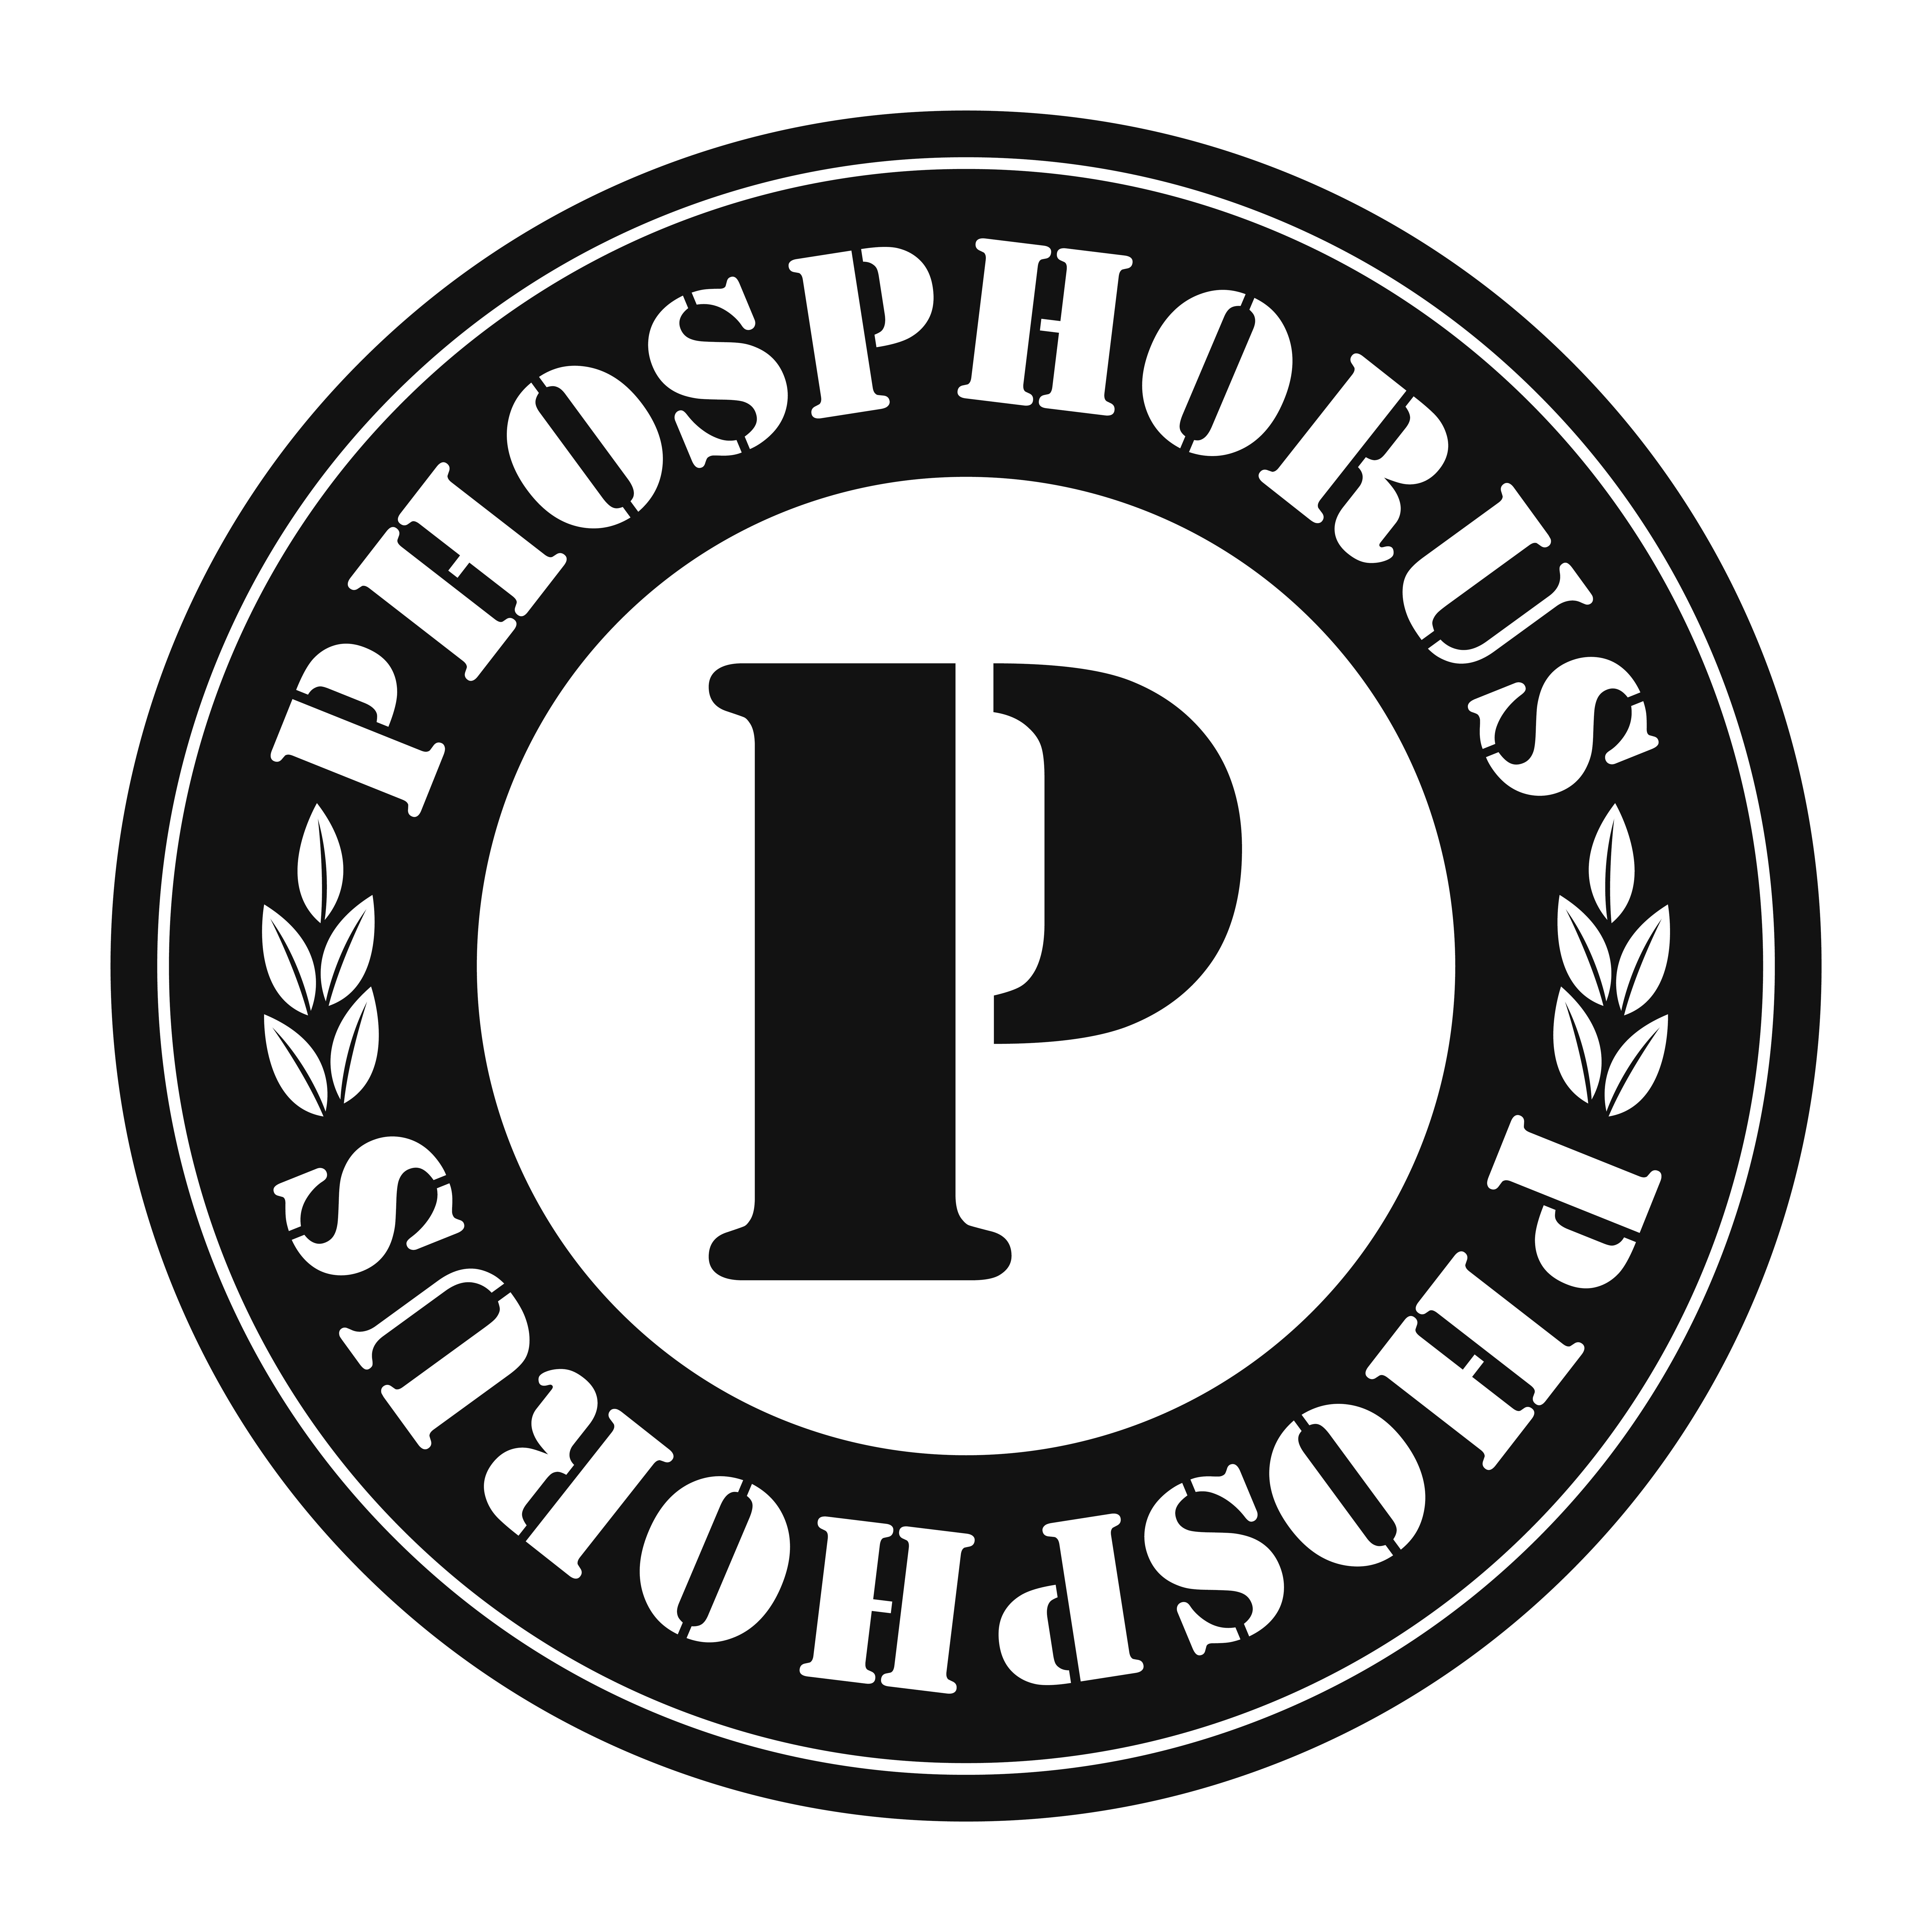 2-D Phosphorus/Black Phosphorus